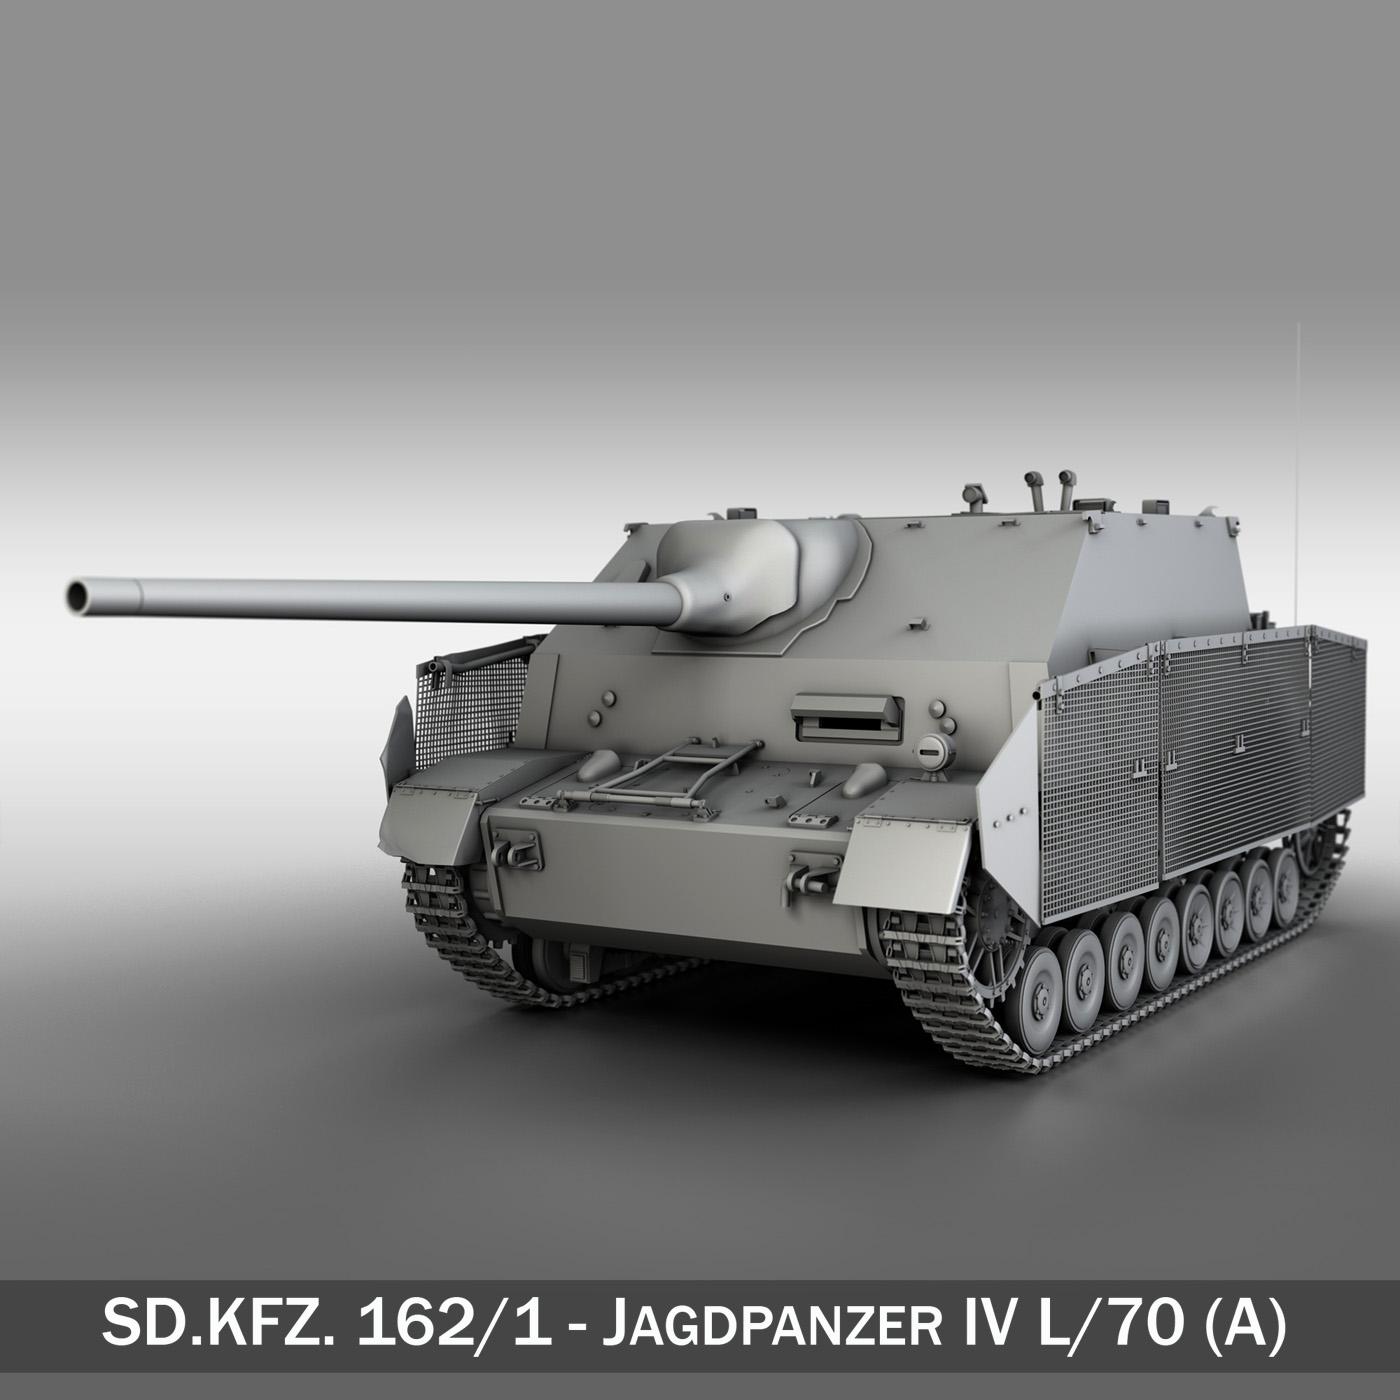 jagdpanzer iv l/70 (a) – sd.kfz 162/1 3d model 3ds fbx c4d lwo obj 202007